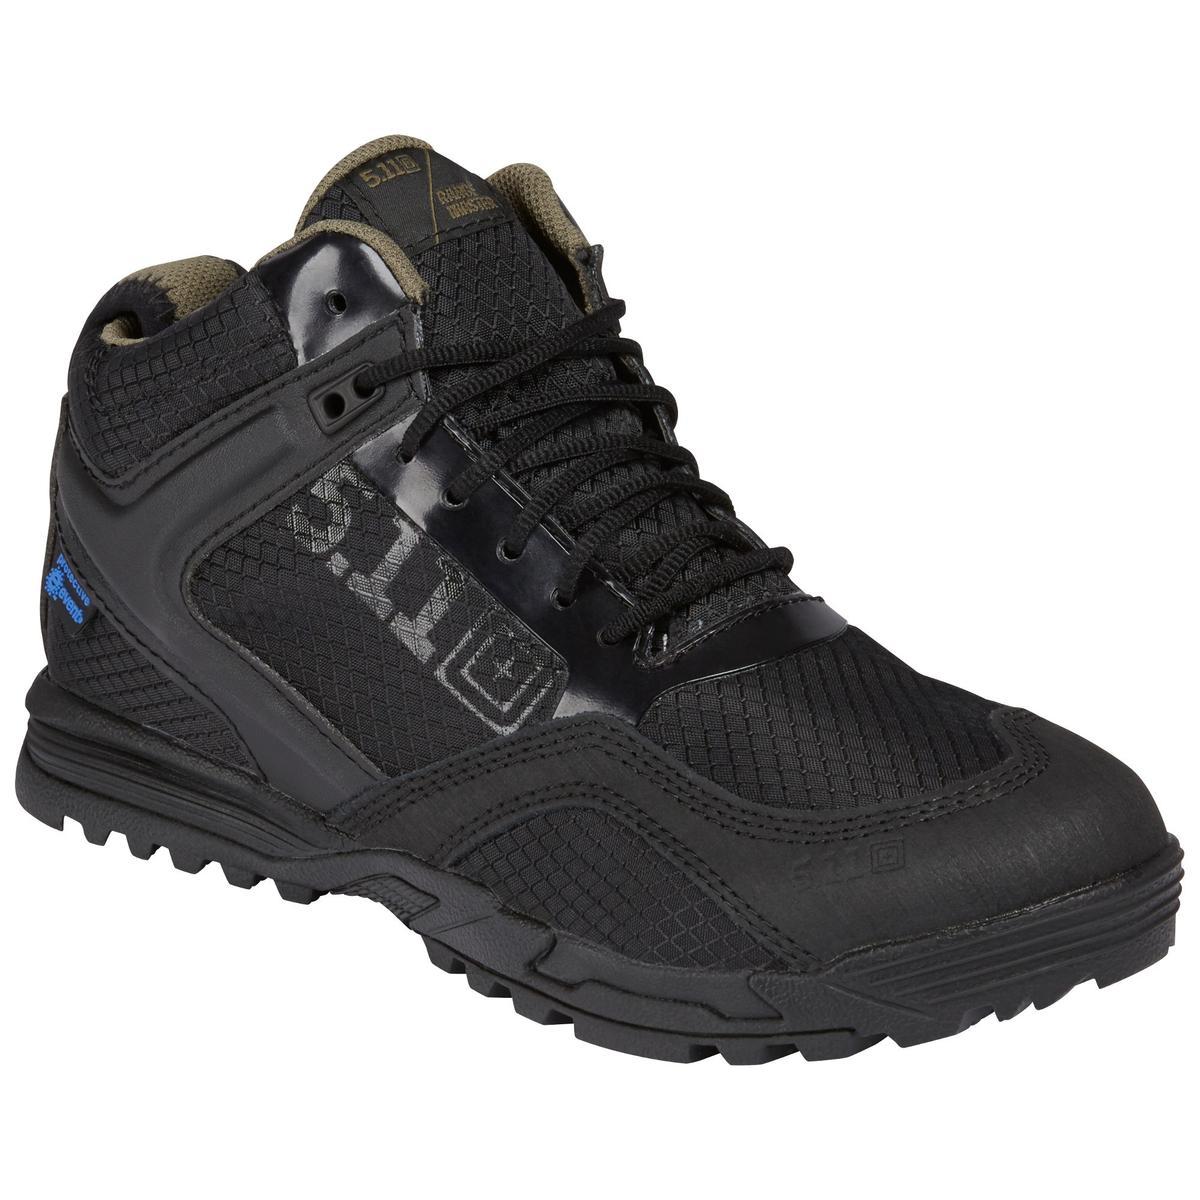 Tactical Tennis Shoes